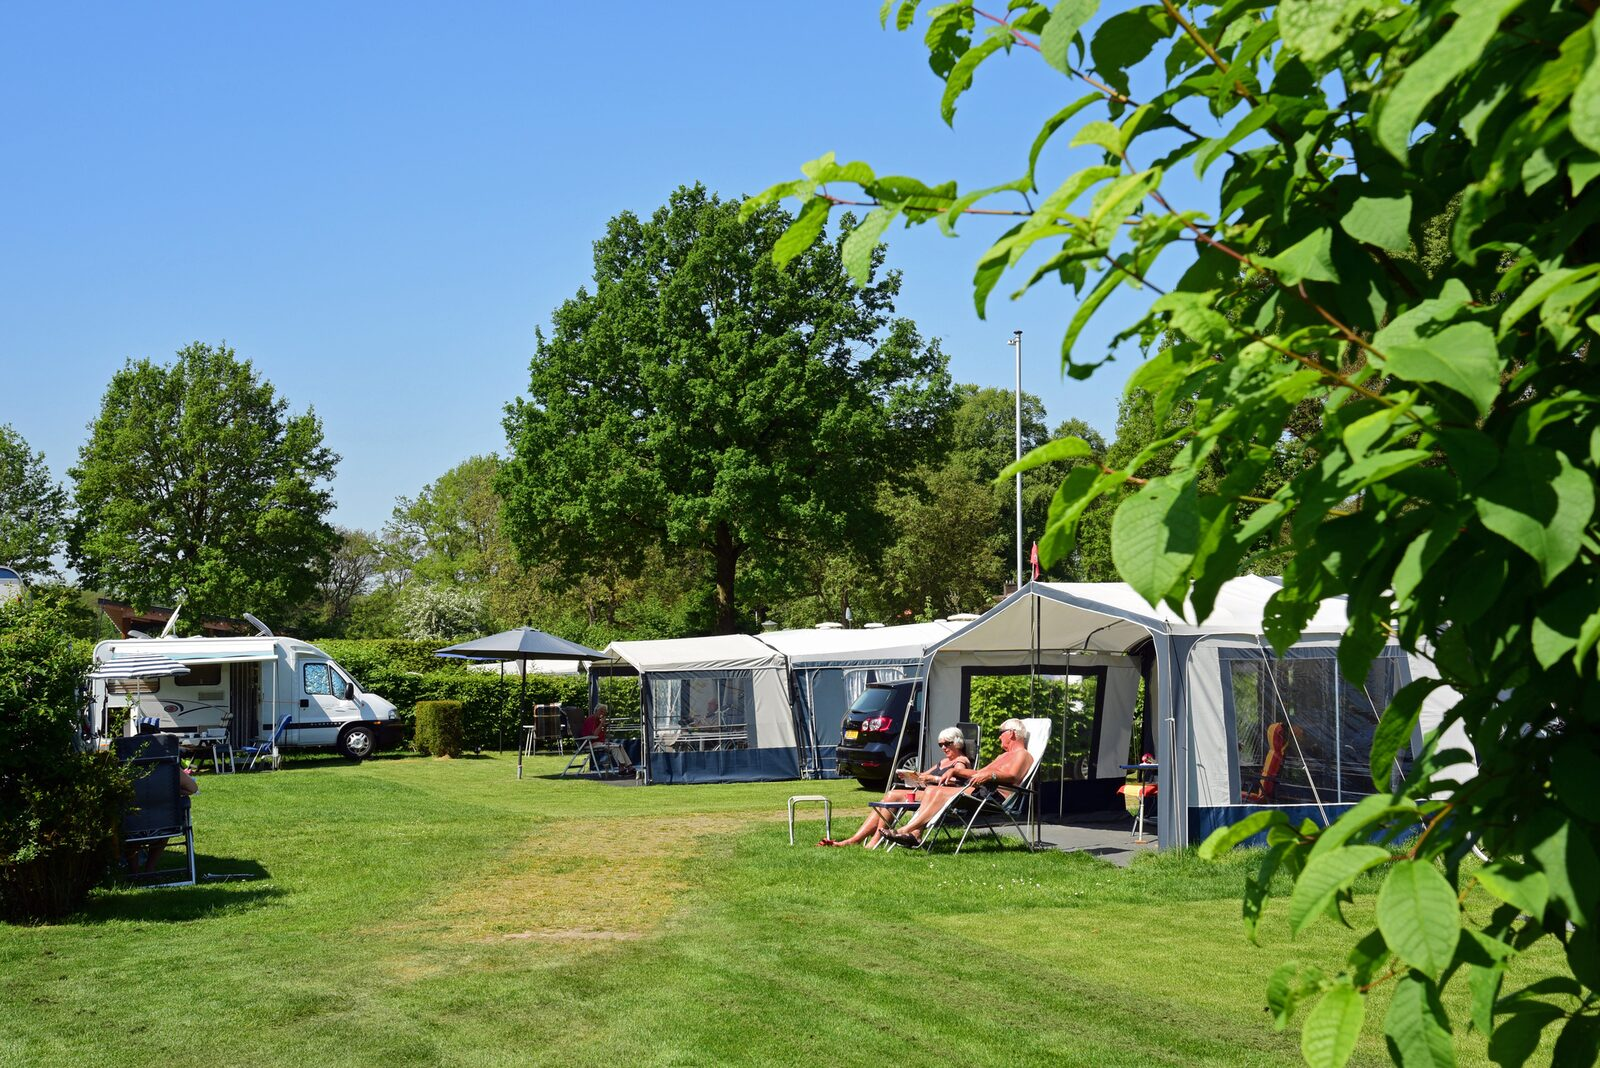 Basic camping spot